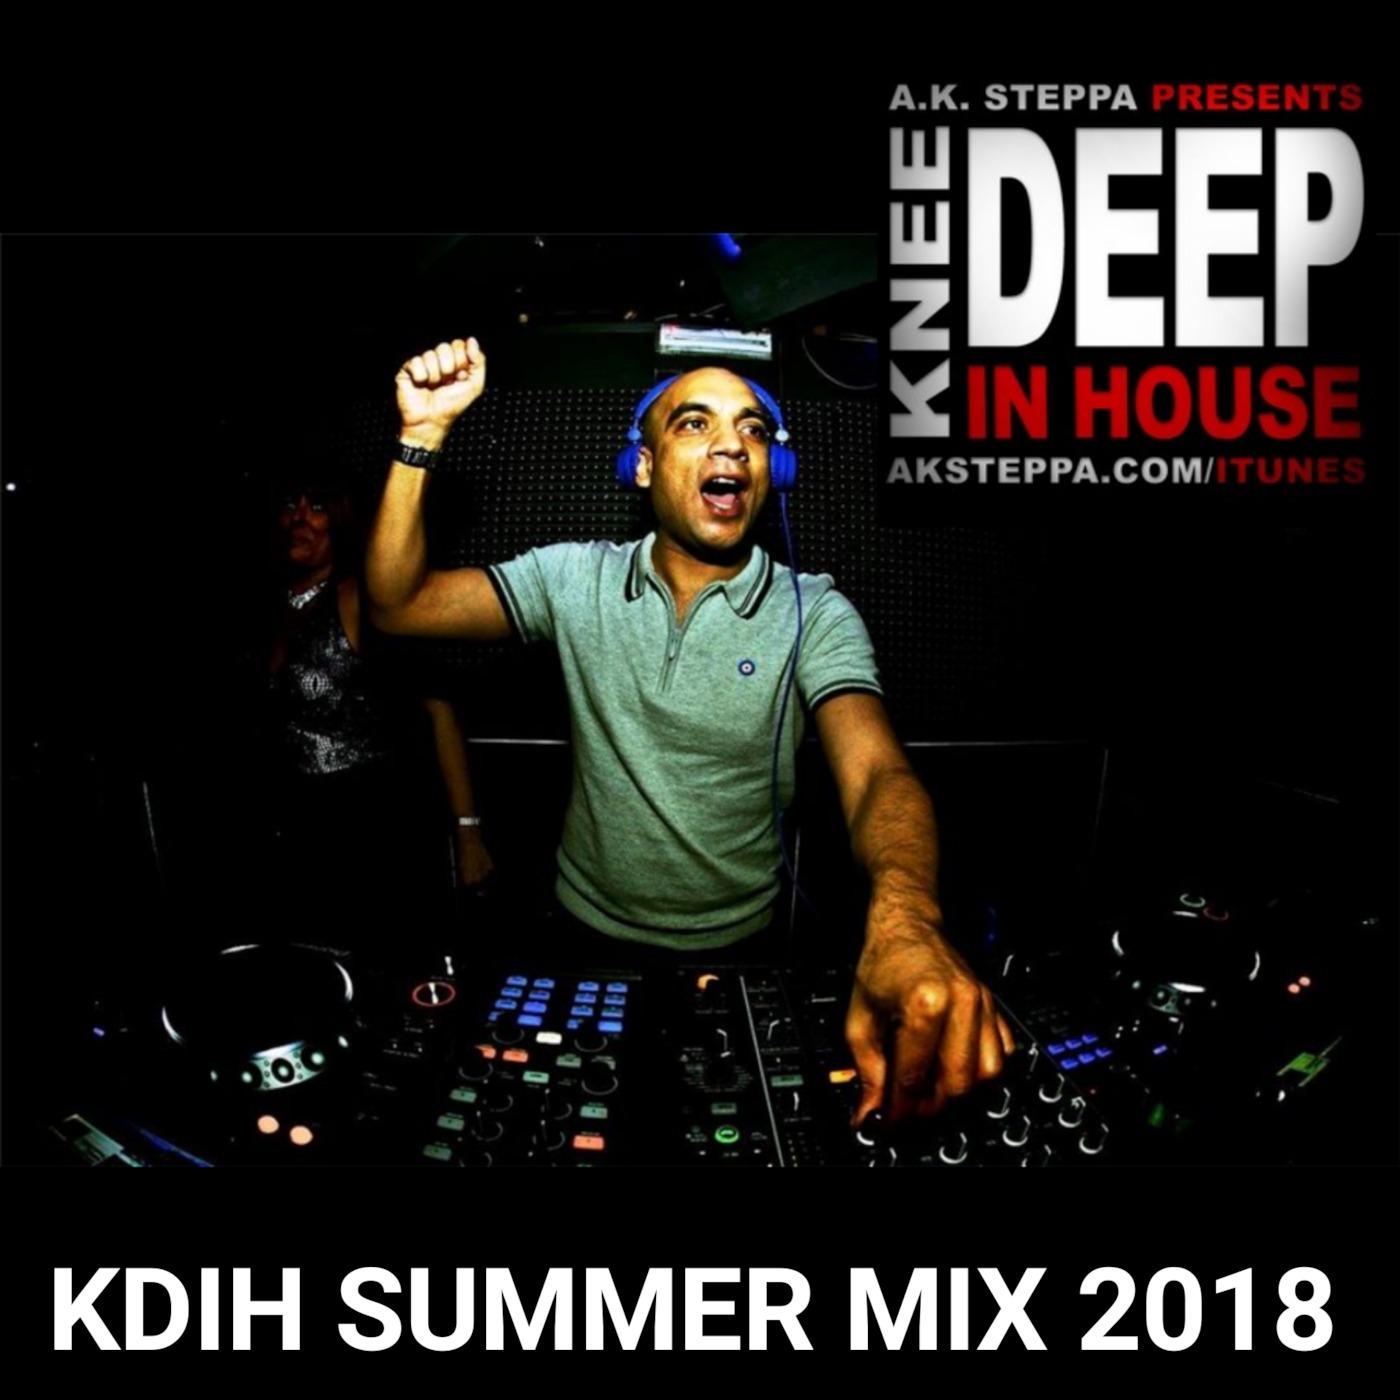 KDIH SUMMER 2018 MIX :: DJ @AKSTEPPA House Music | Deephouse